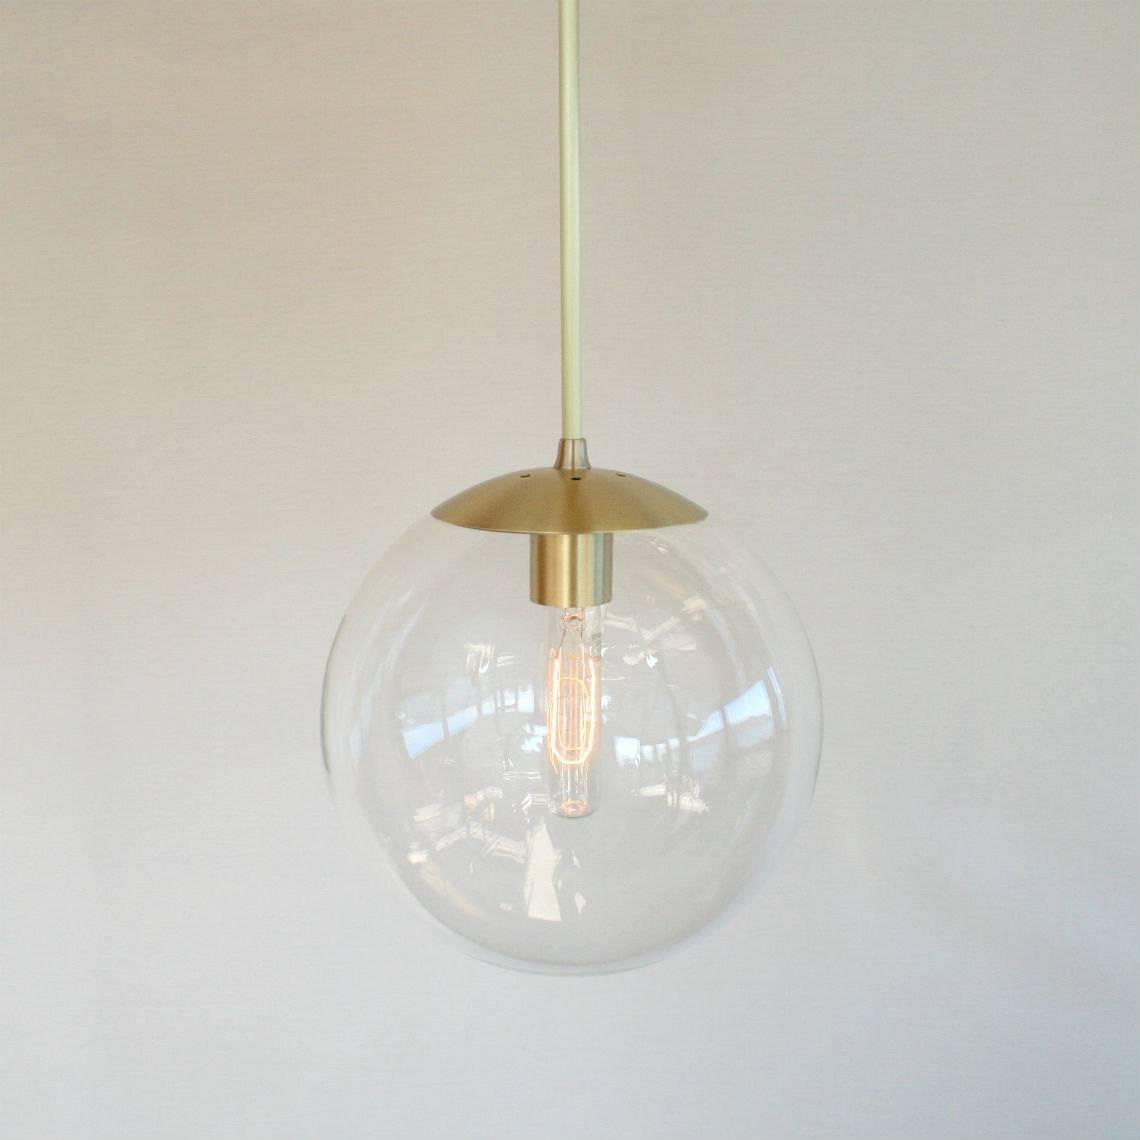 Astonishing Globe Light Pendant 62 With Additional Glass Orb with Glass Orb Pendant Lights (Image 4 of 15)